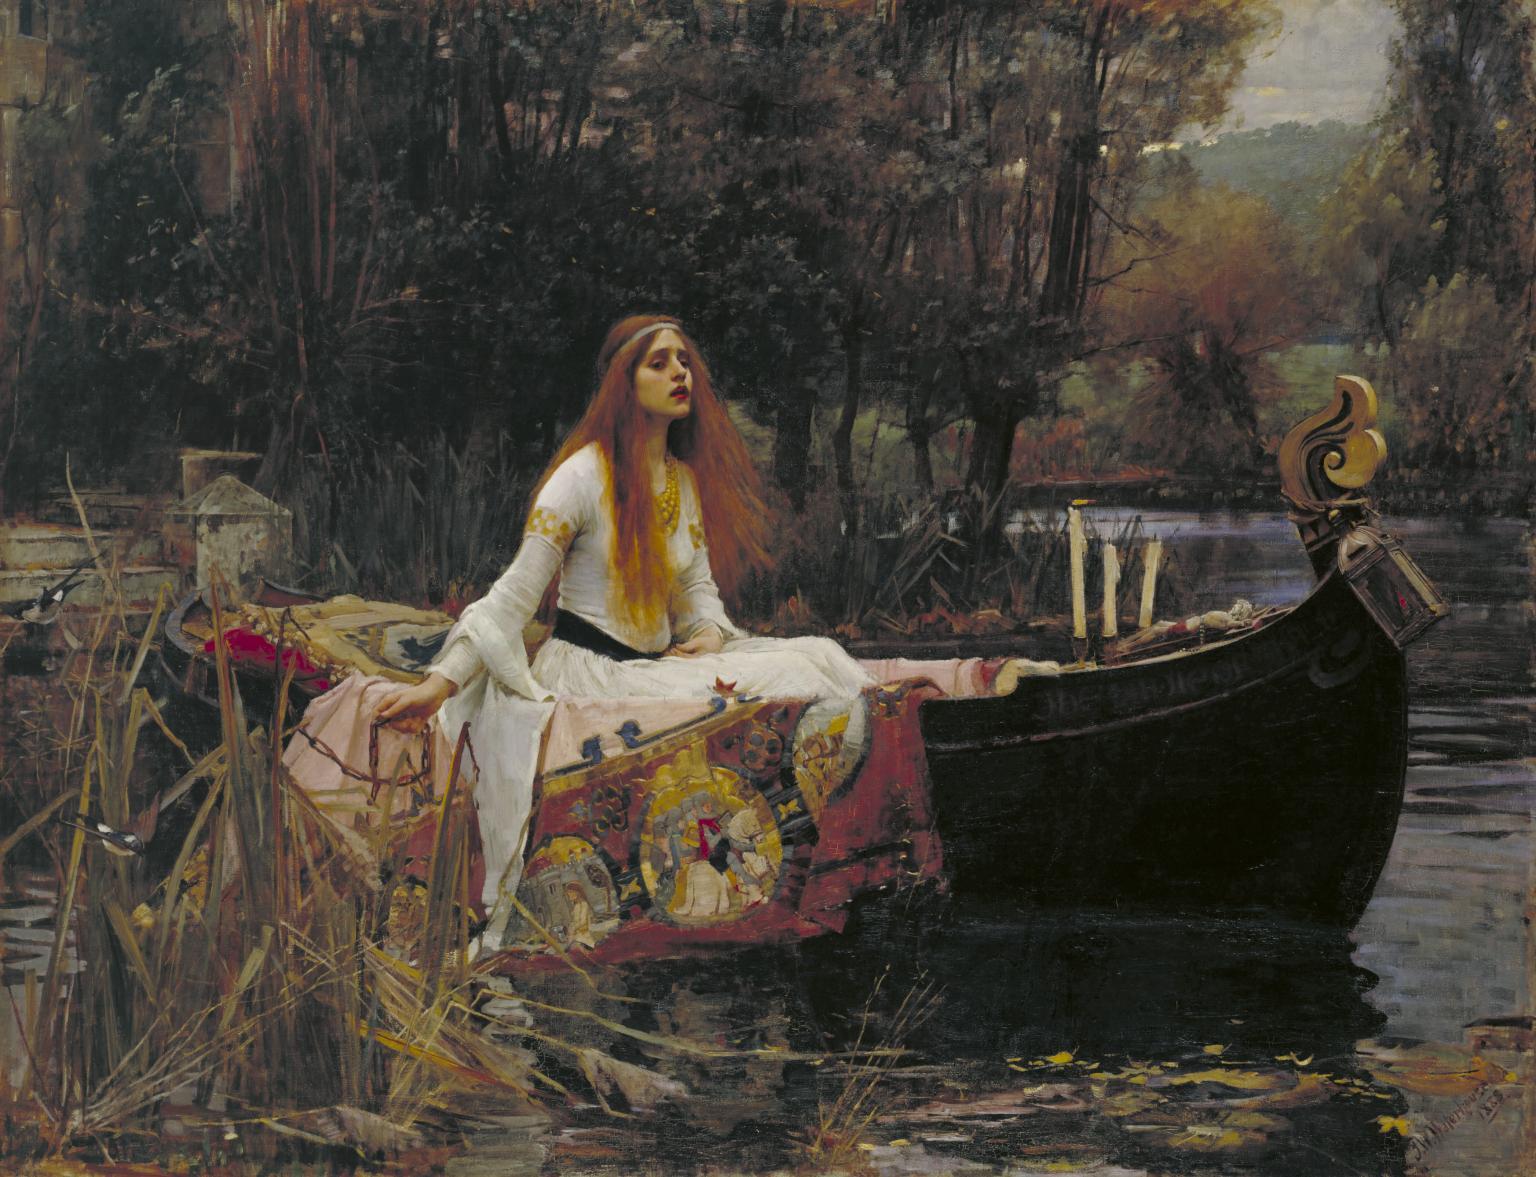 La nostalgia medieval de John William Waterhouse